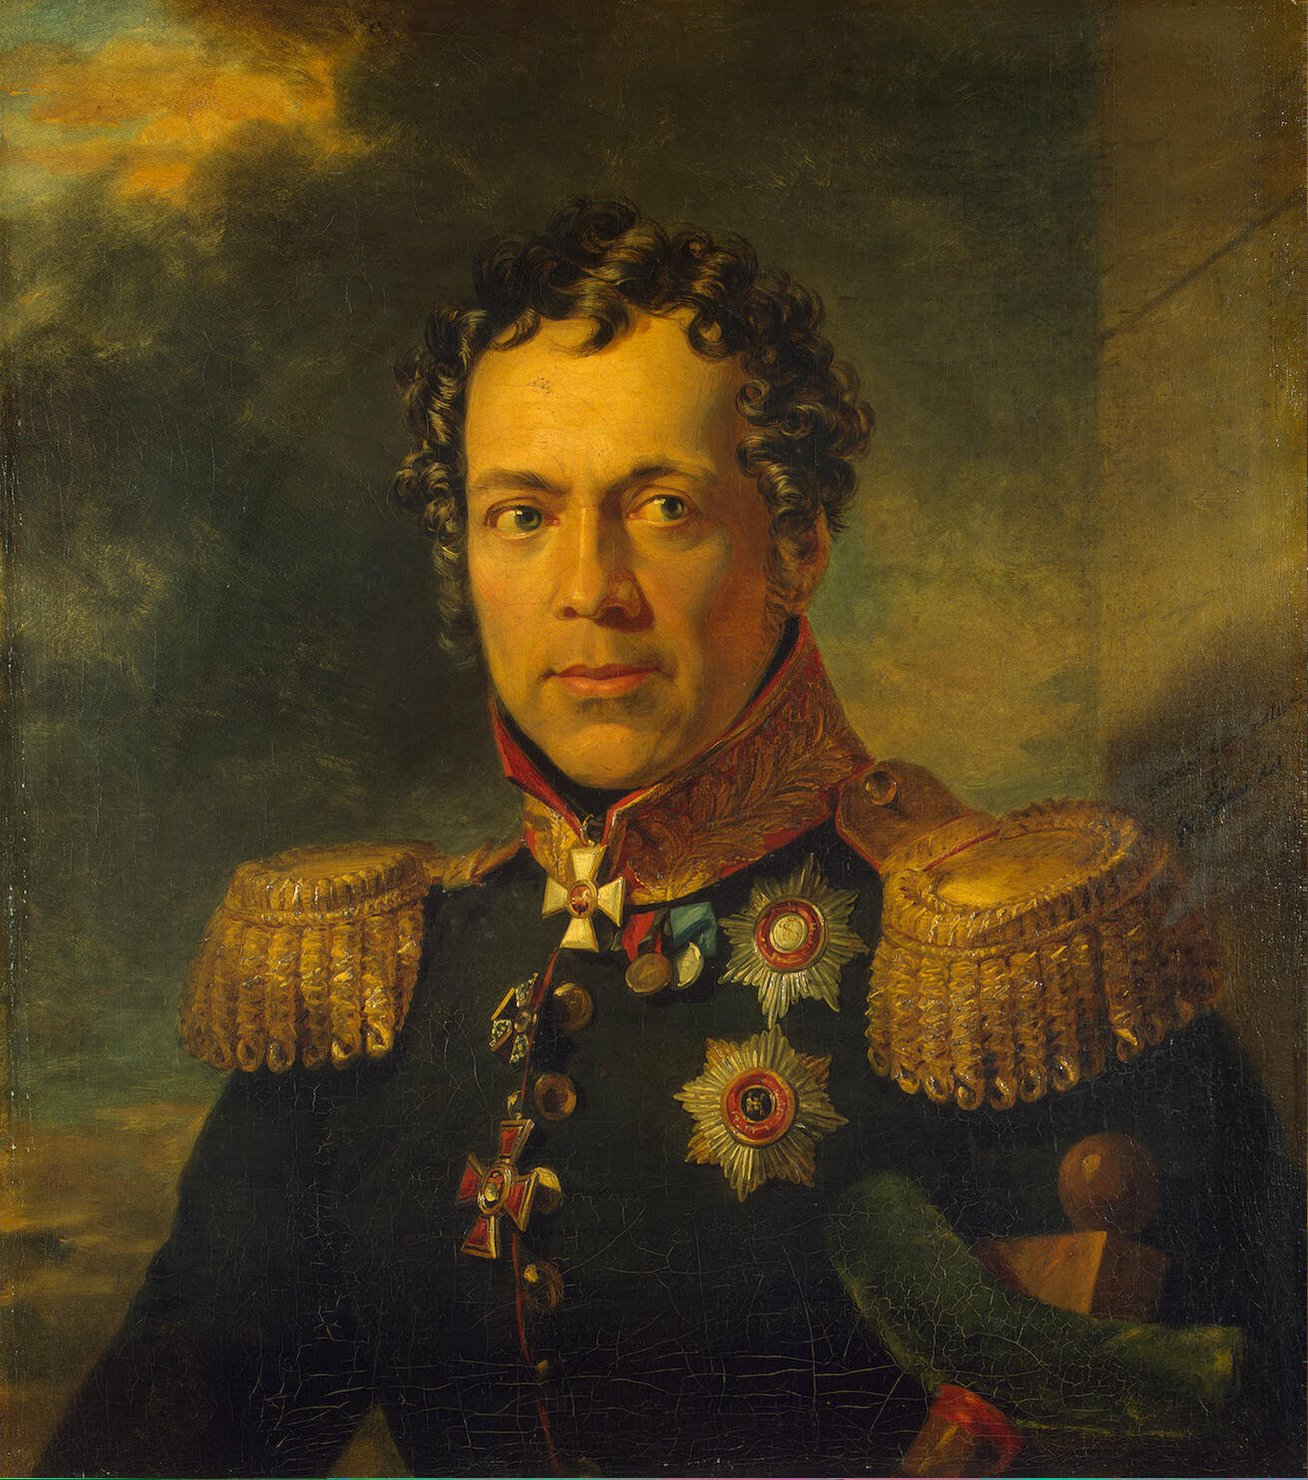 Бахметев, Алексей Николаевич